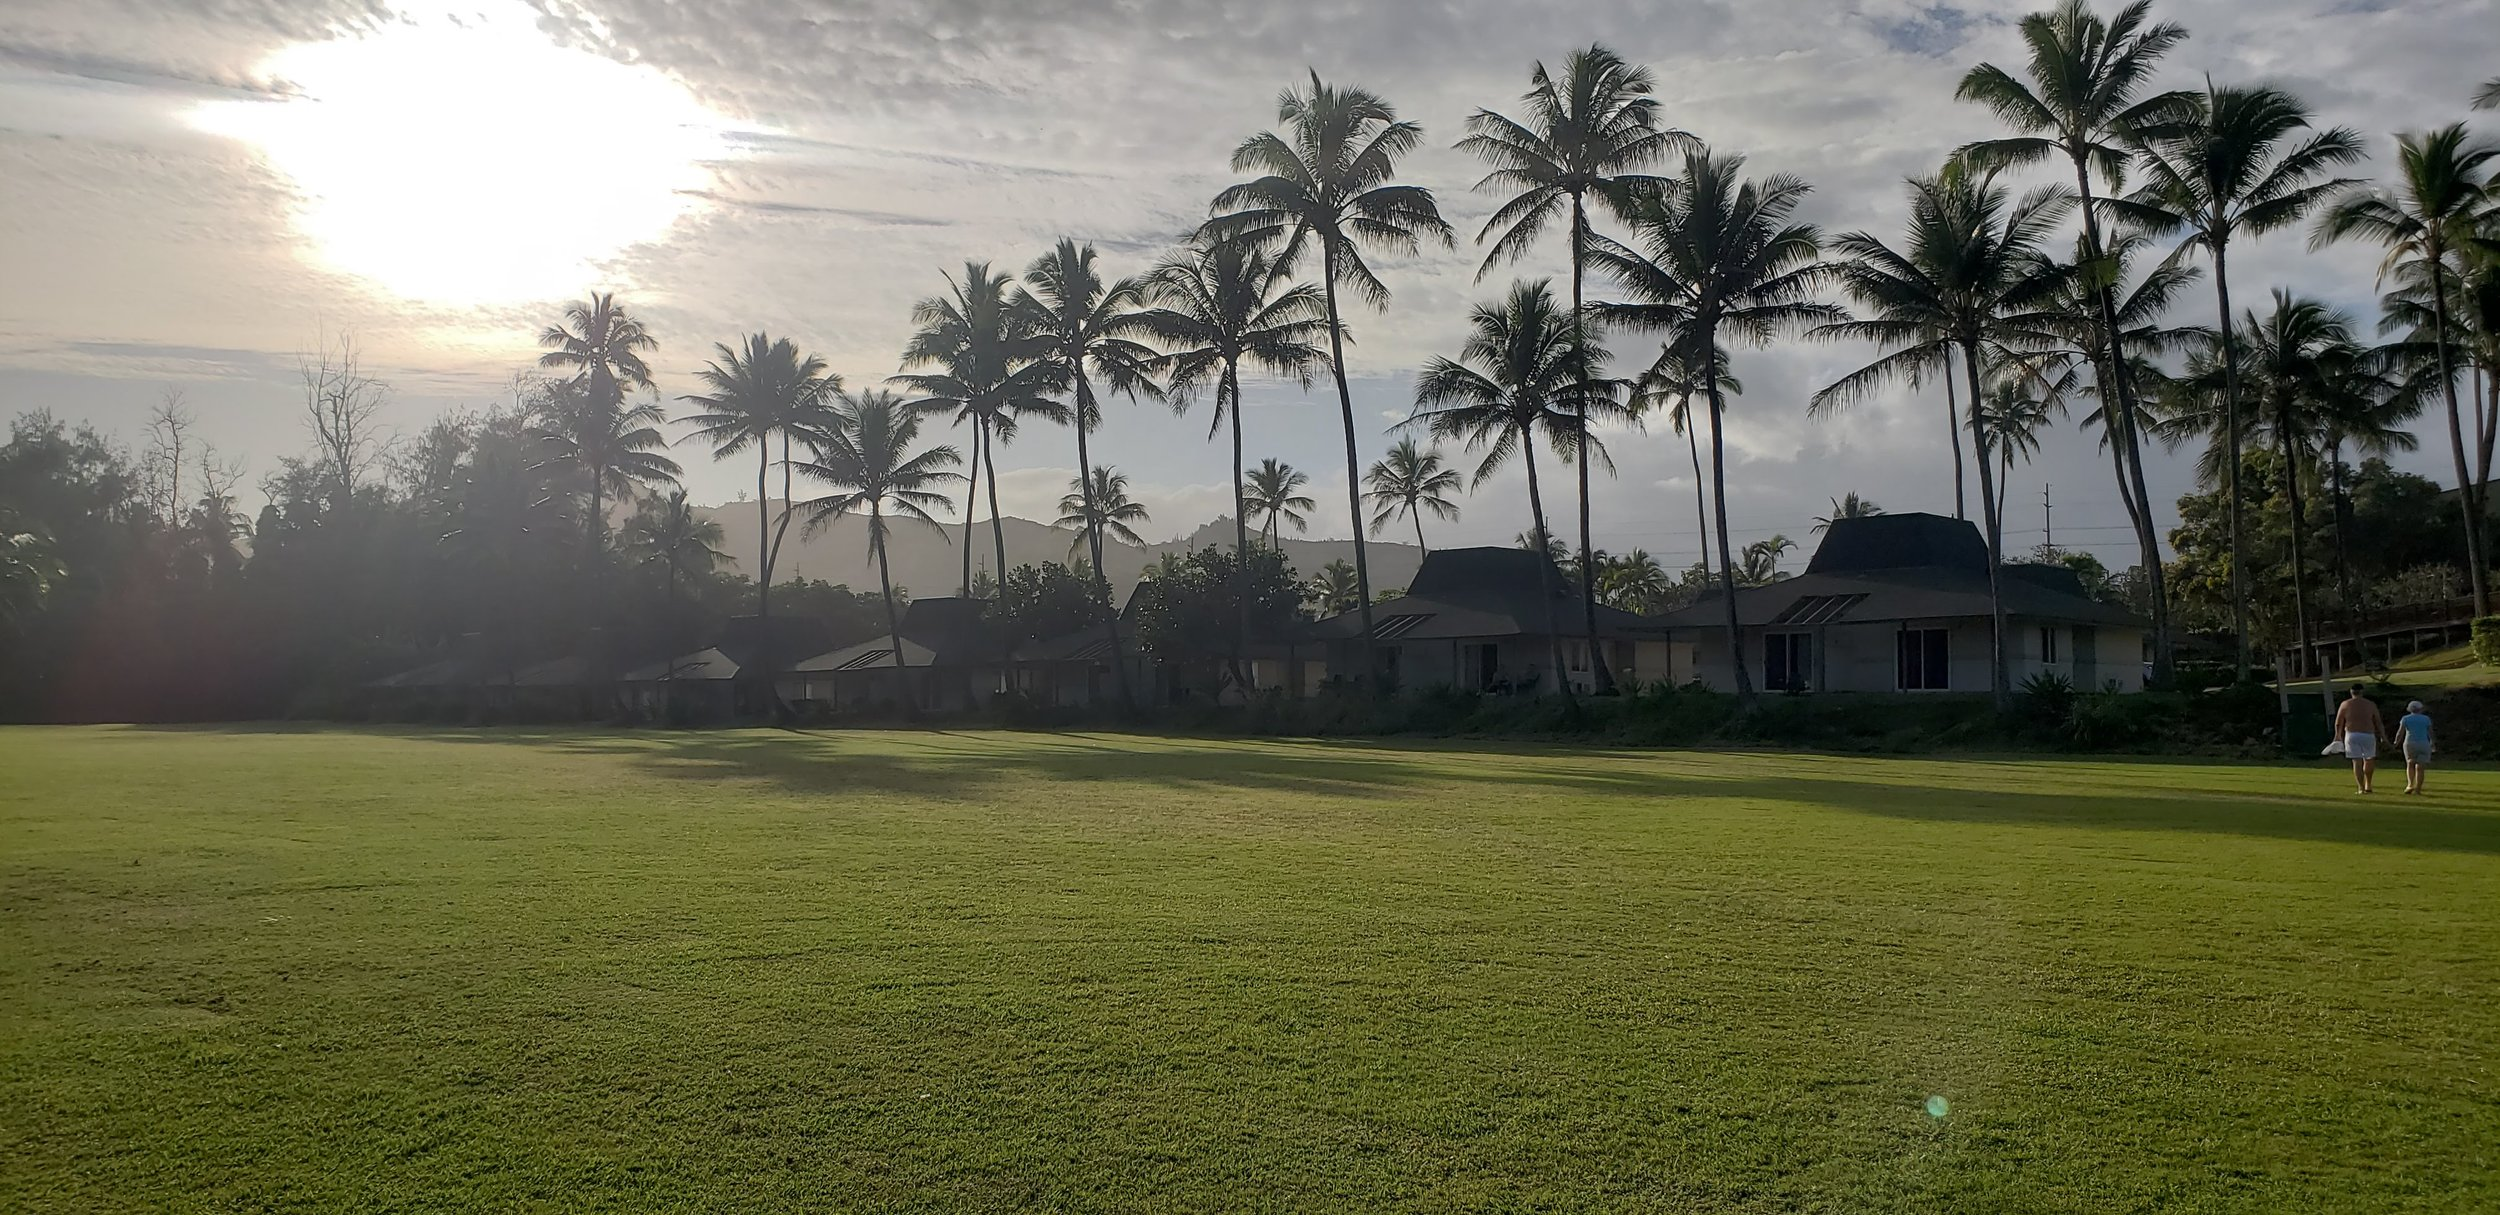 We got a nice little cottage house in Kauai via my Hilton points